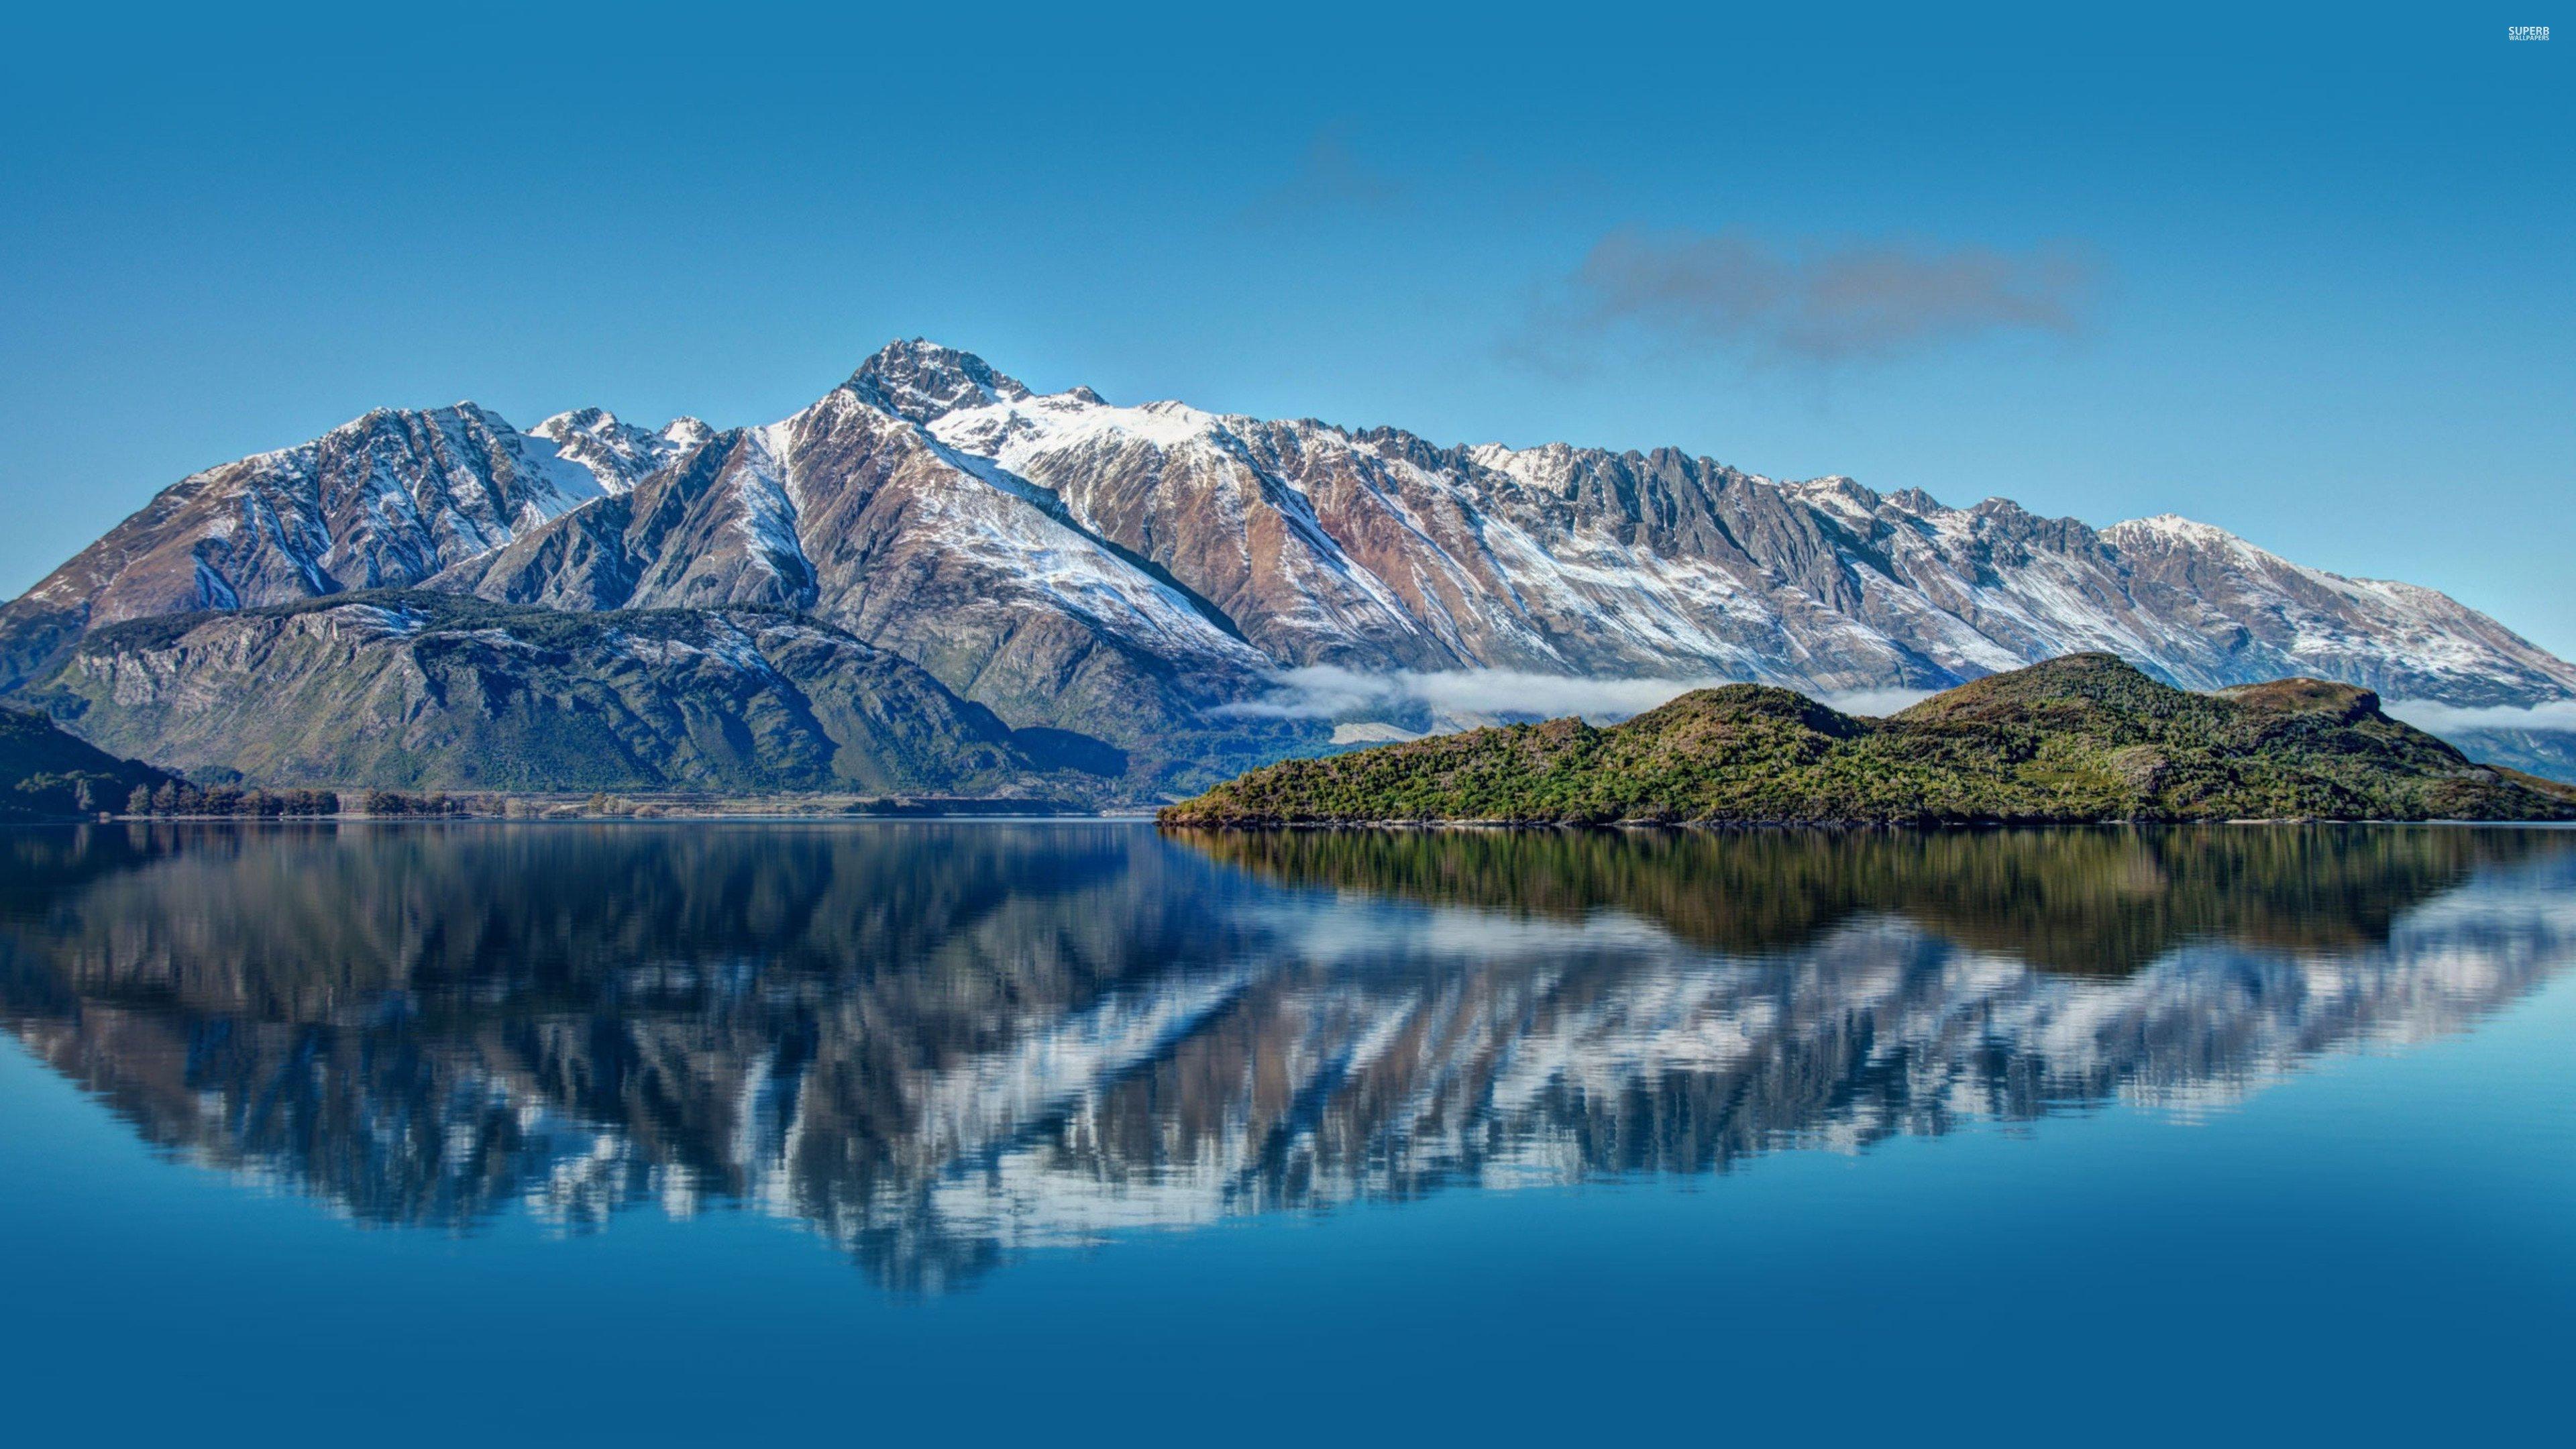 Amoklauf Neuseeland Video Hd: Pyramid-lake-new-zealand-24104-3840x2160 Wallpaper